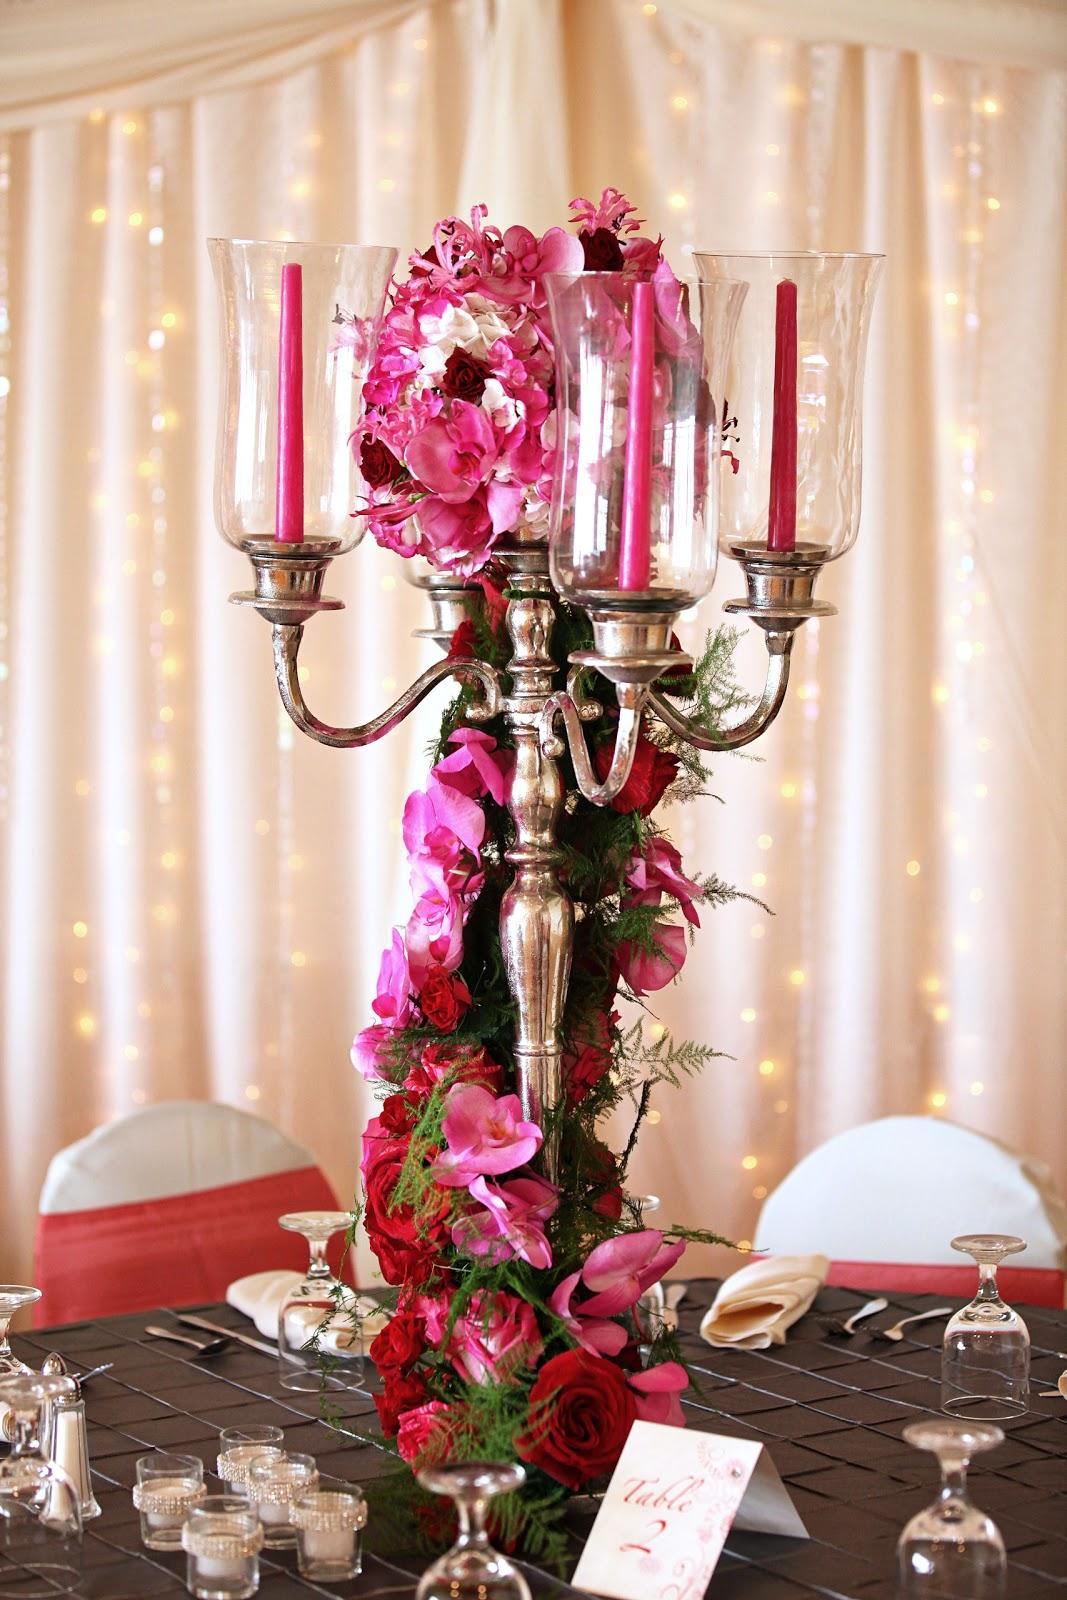 Jens Wedding Centerpieces Beautiful Blooms By Jen